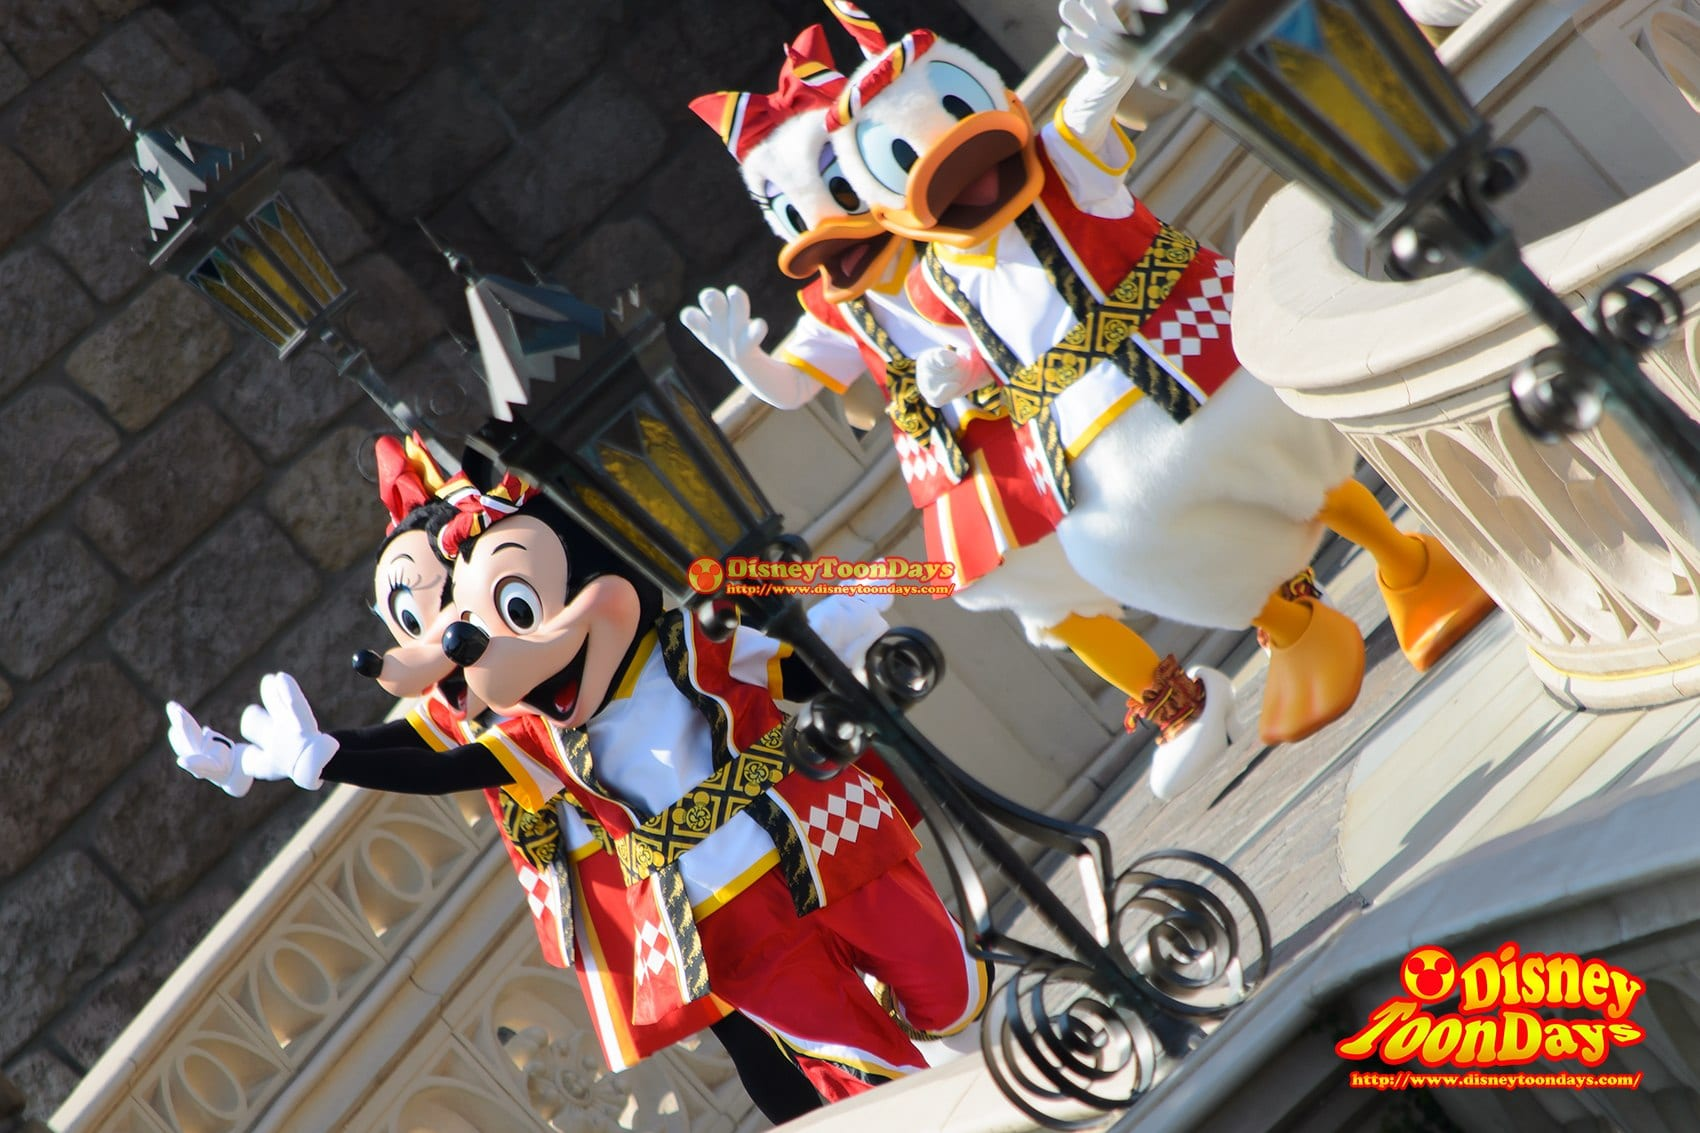 TDL ディズニー夏祭り 2014 おんどこどん ドナルドダック デイジーダック ミッキーマウス ミニーマウス